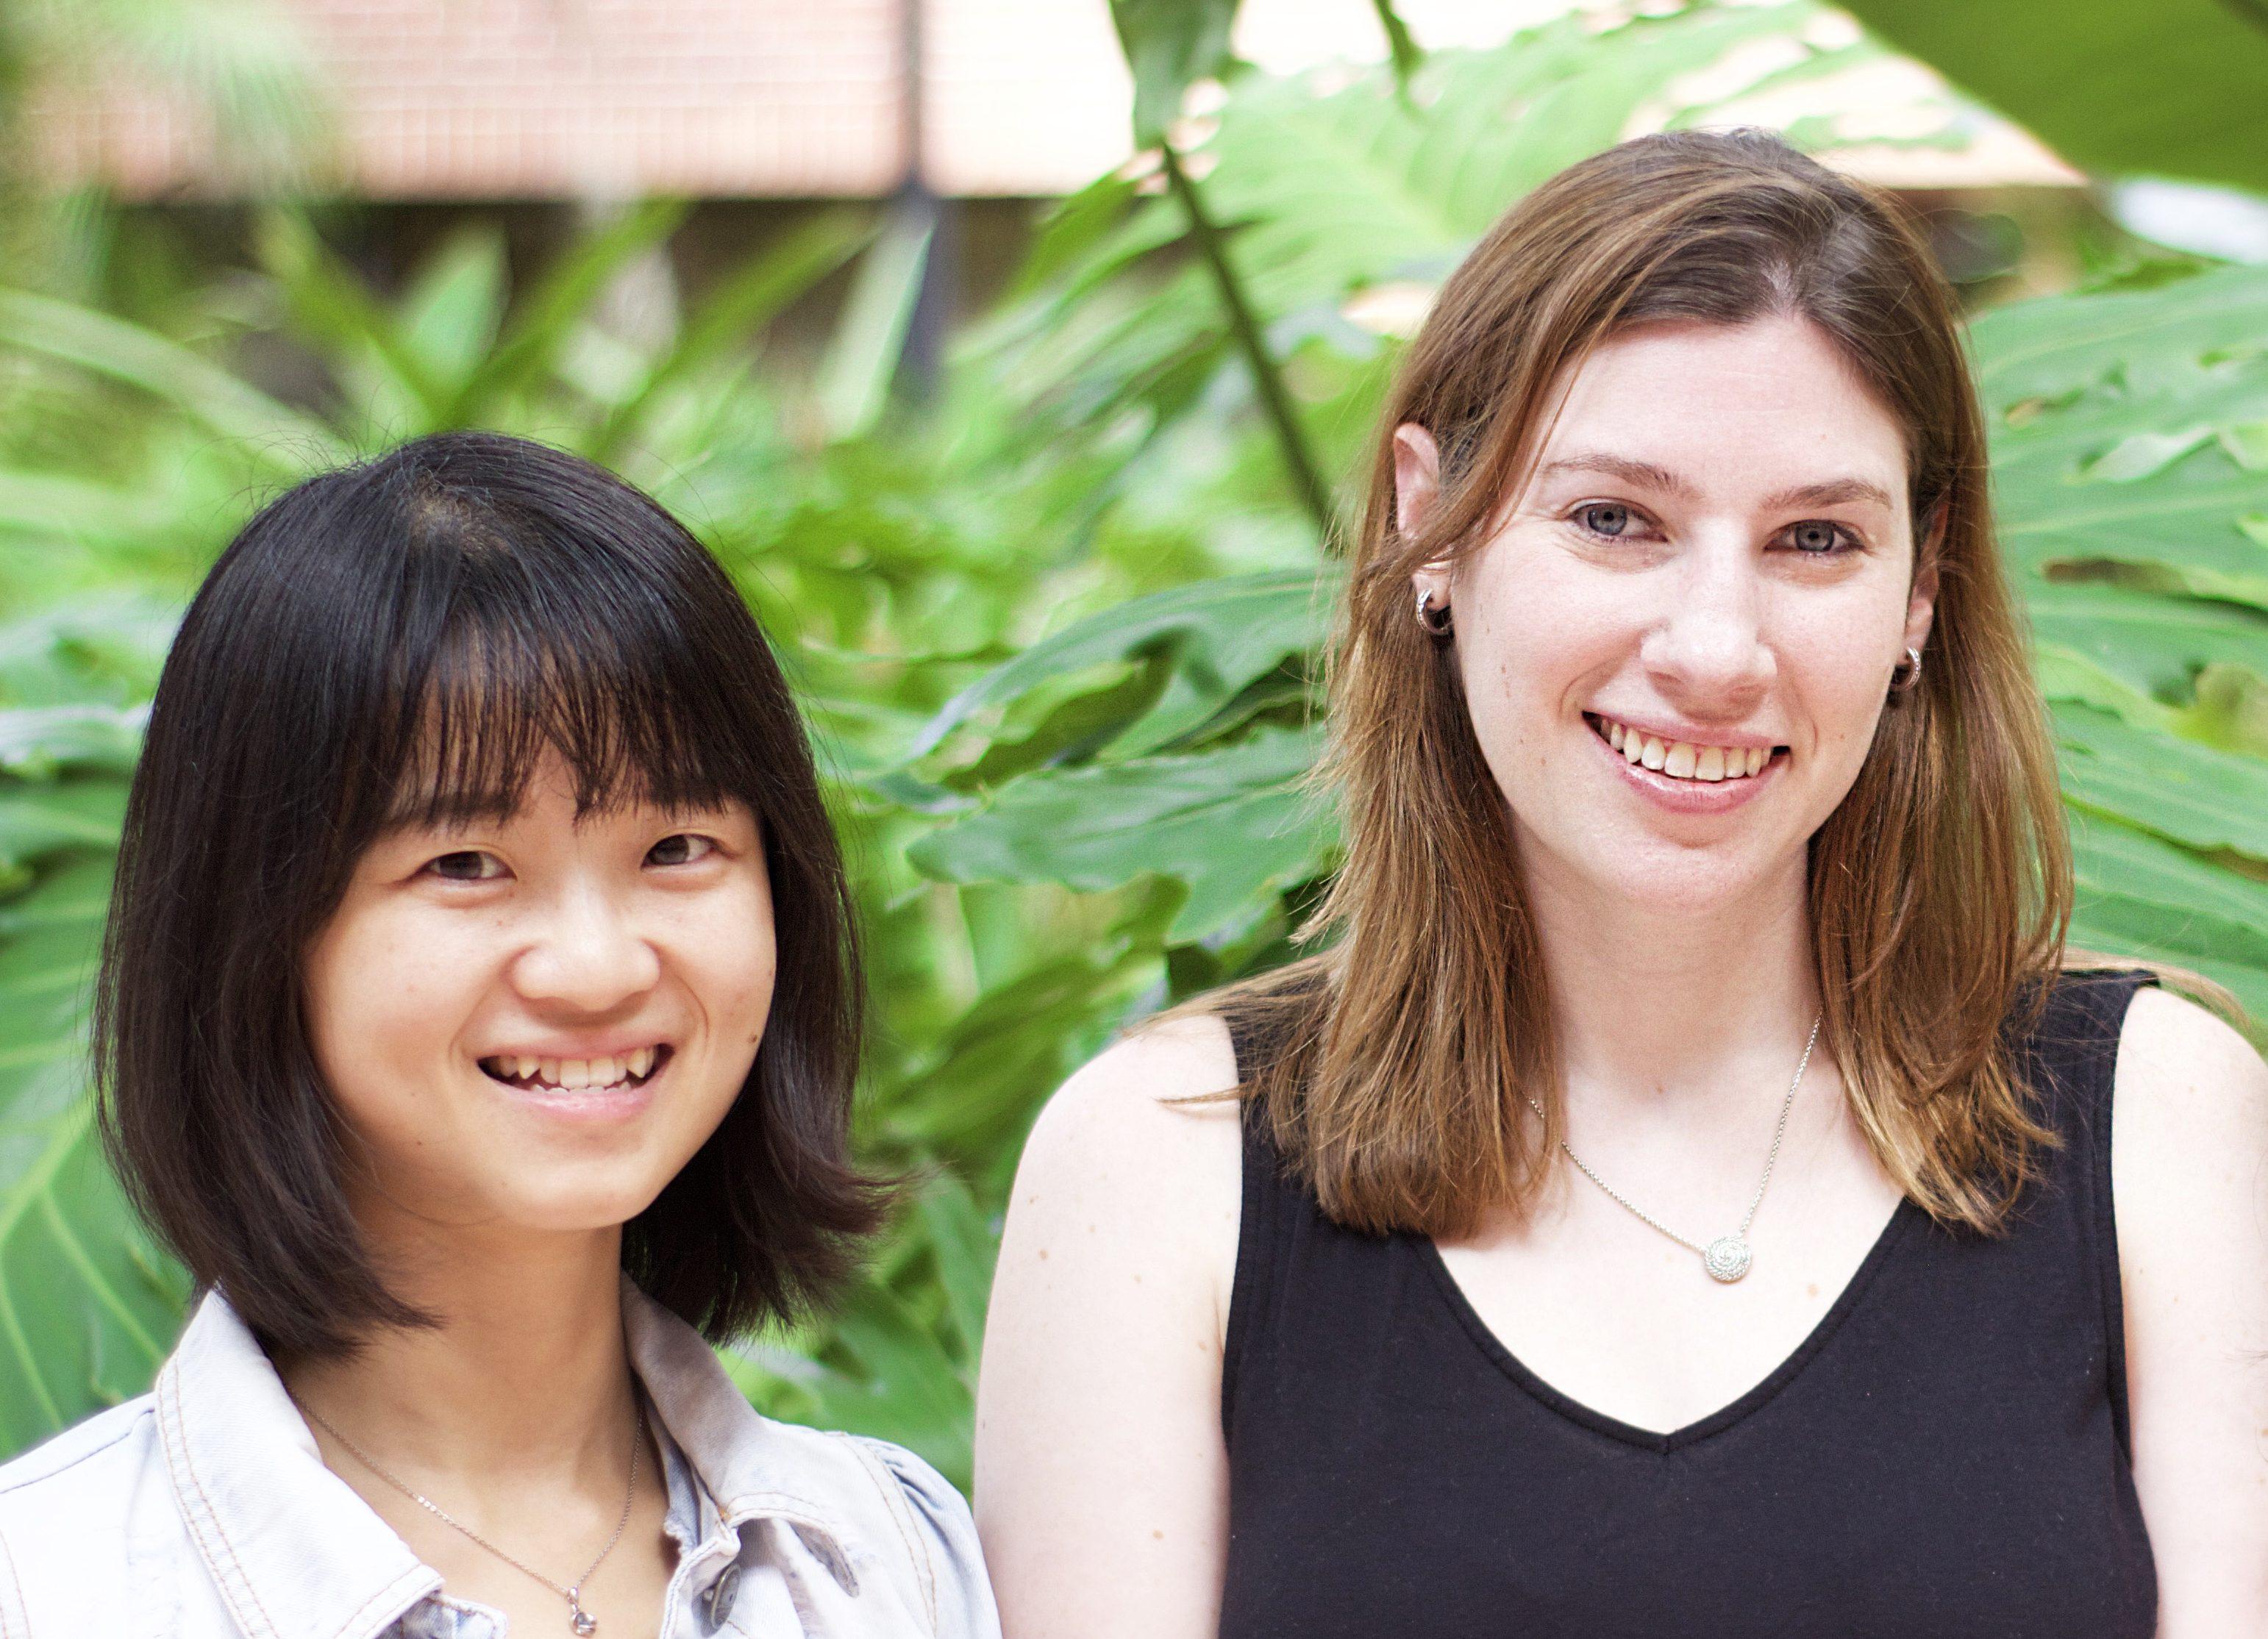 Twinkle Zheng and Sara Germansky